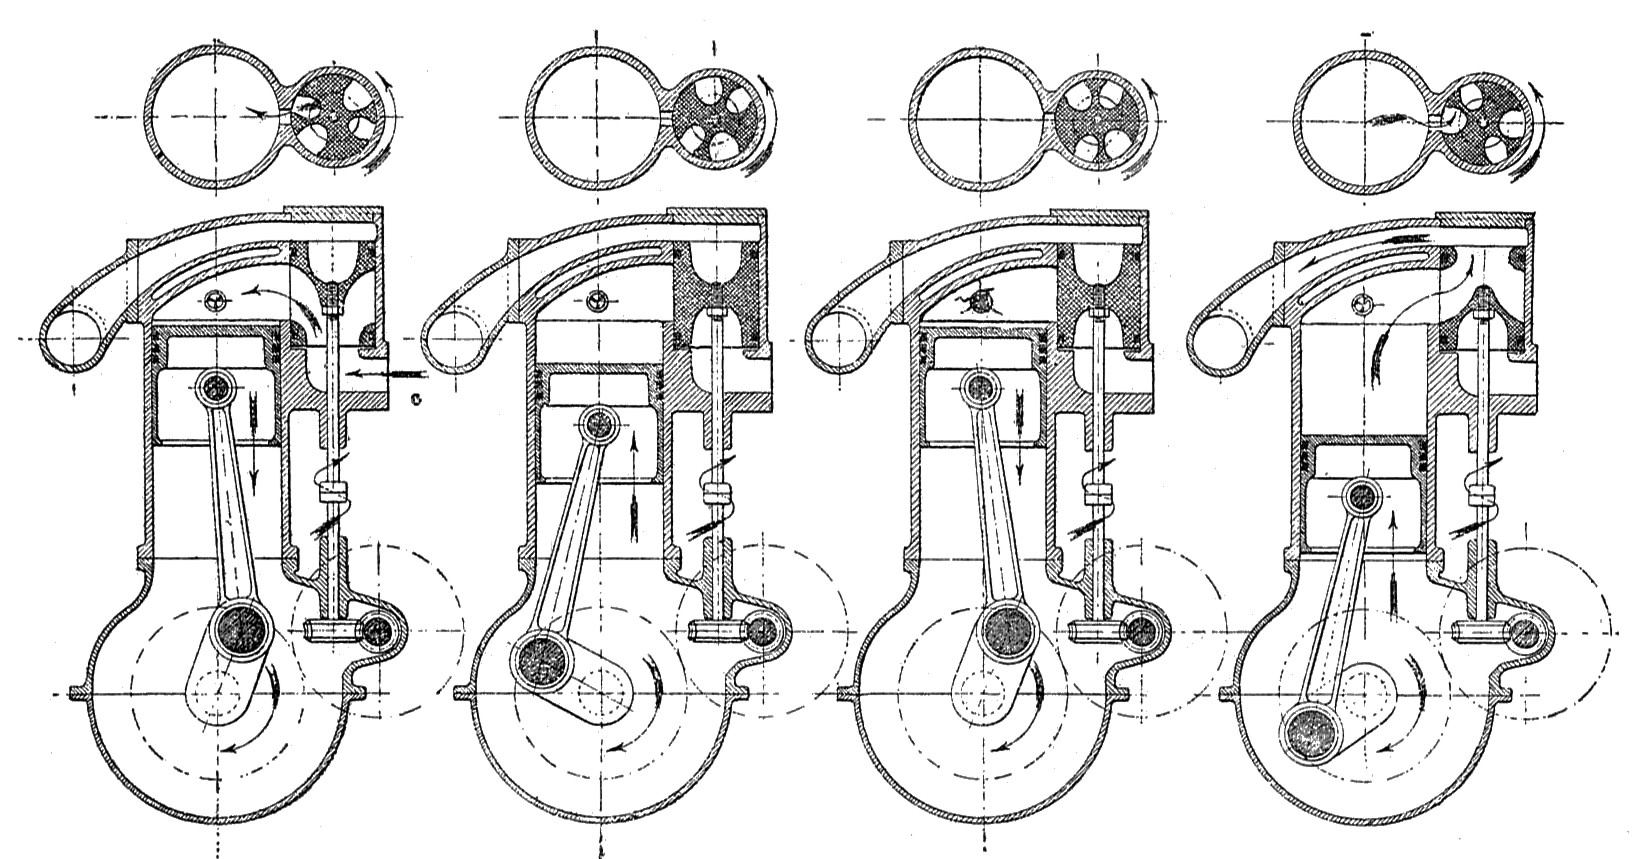 Rotary valve.